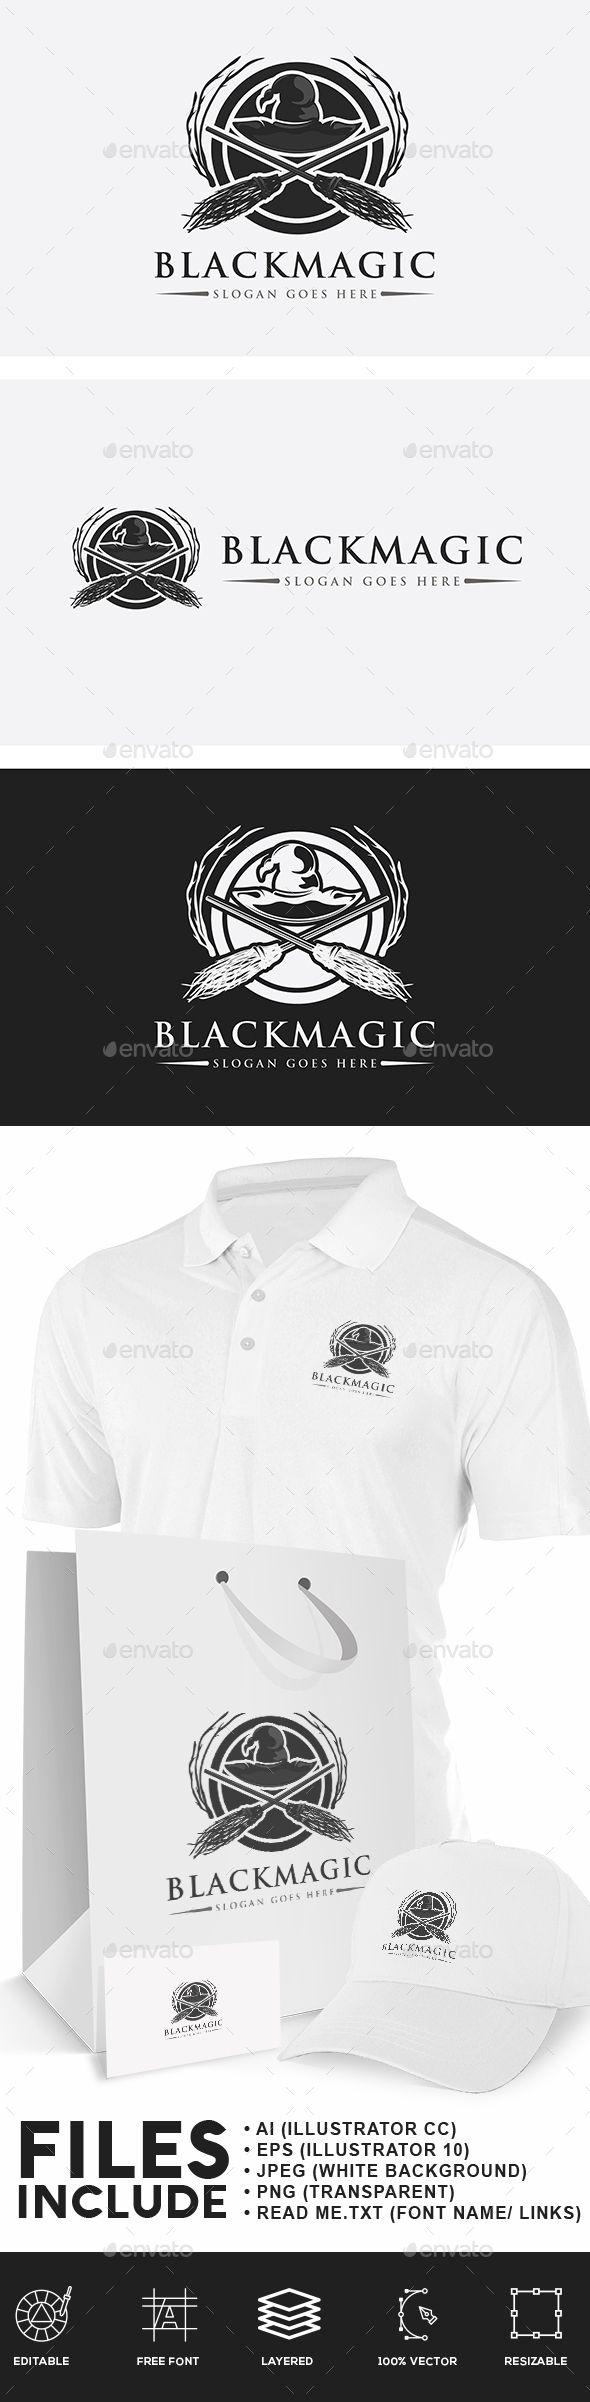 Black Magic Witches Logo Black Magic Identity Design Logo Logo Design Template